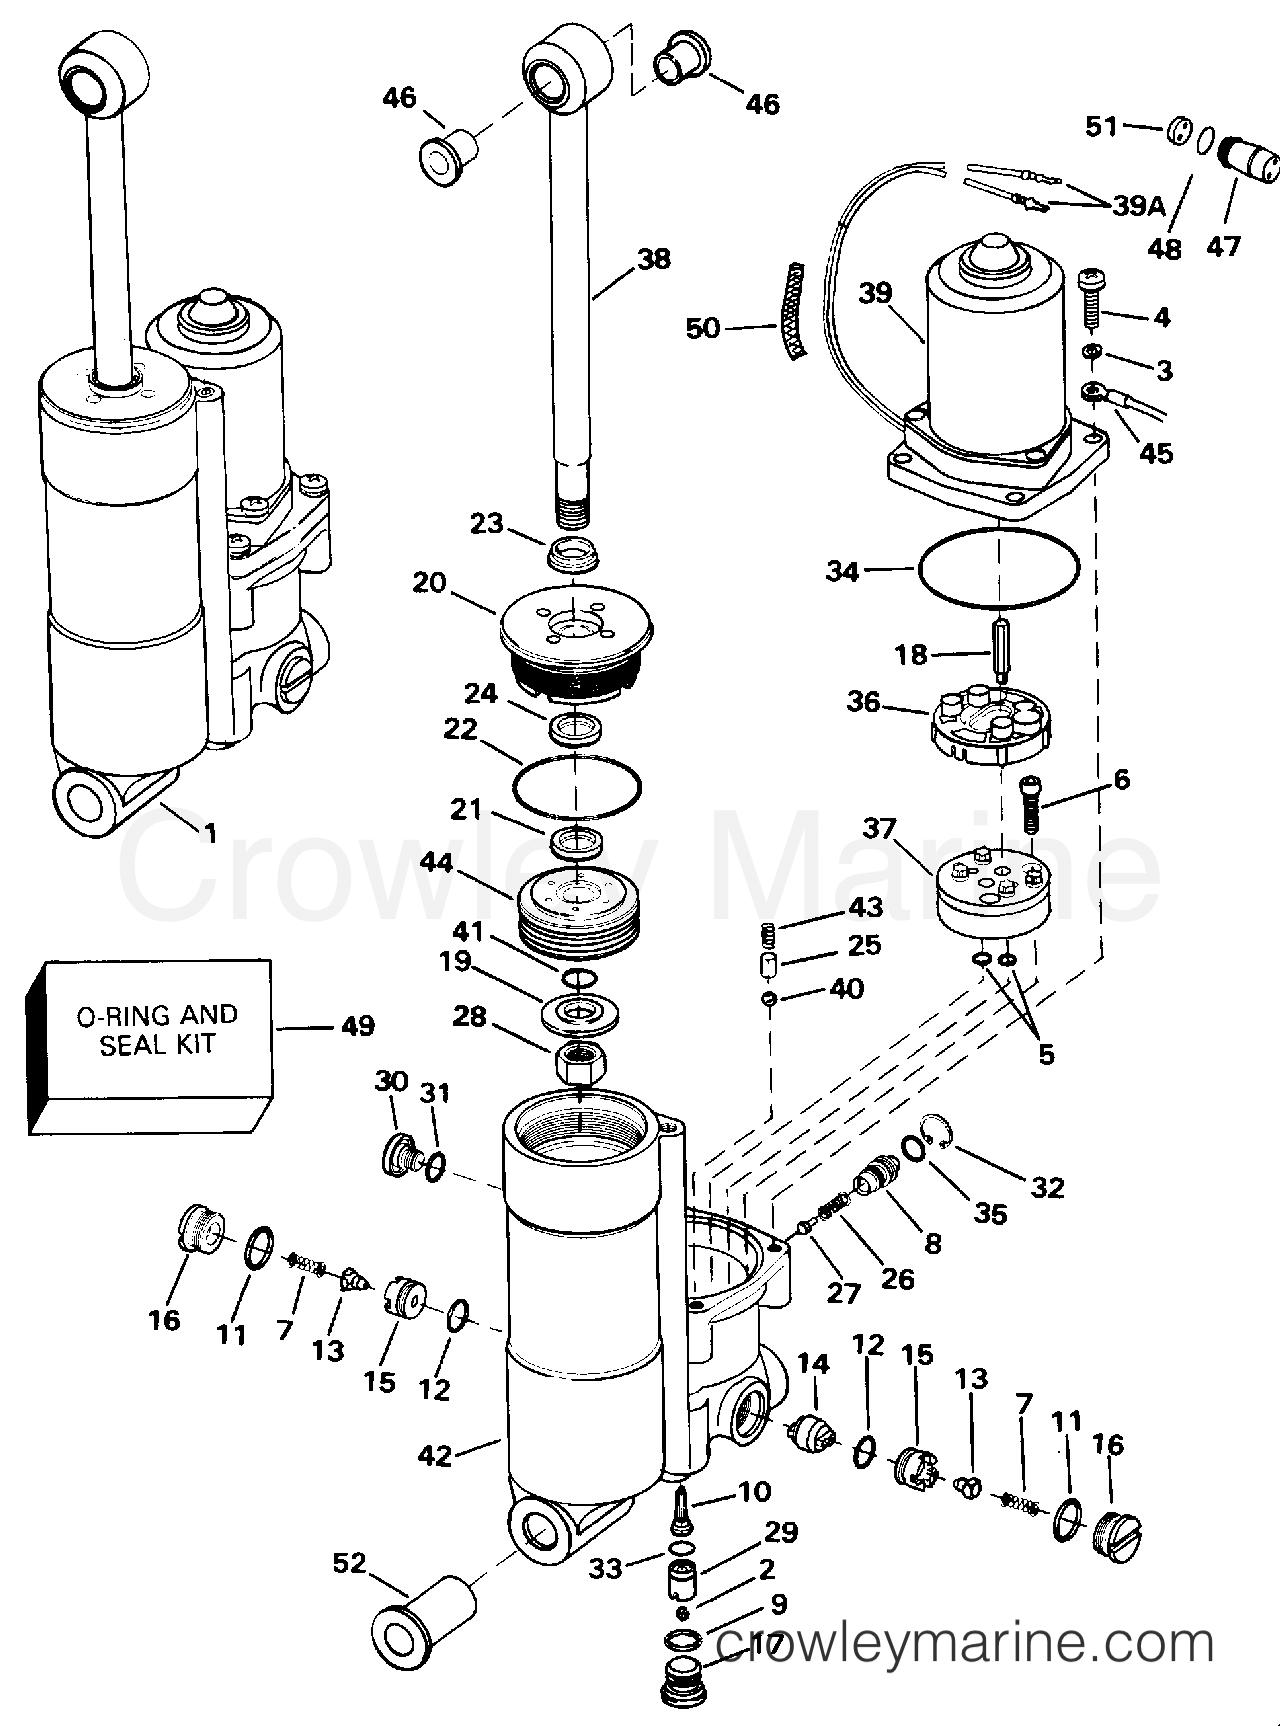 Manual array power trim tilt b model number suffix only 1993 evinrude rh crowleymarine